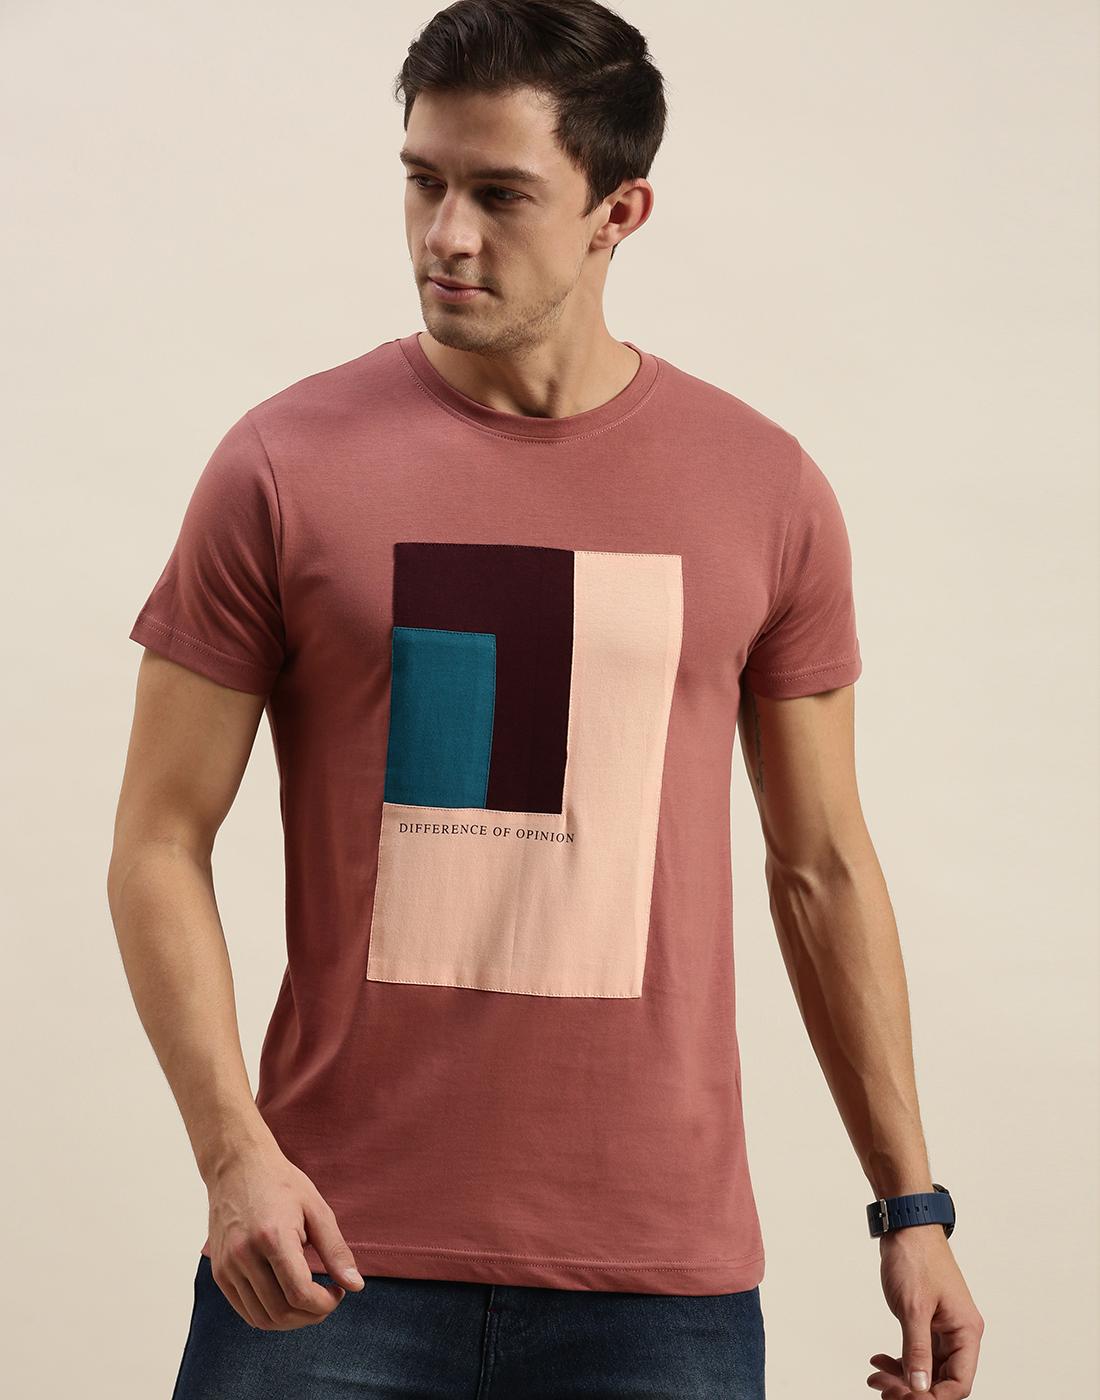 Difference of Opinion | Difference of Opinion Pink Graphic T-Shirt